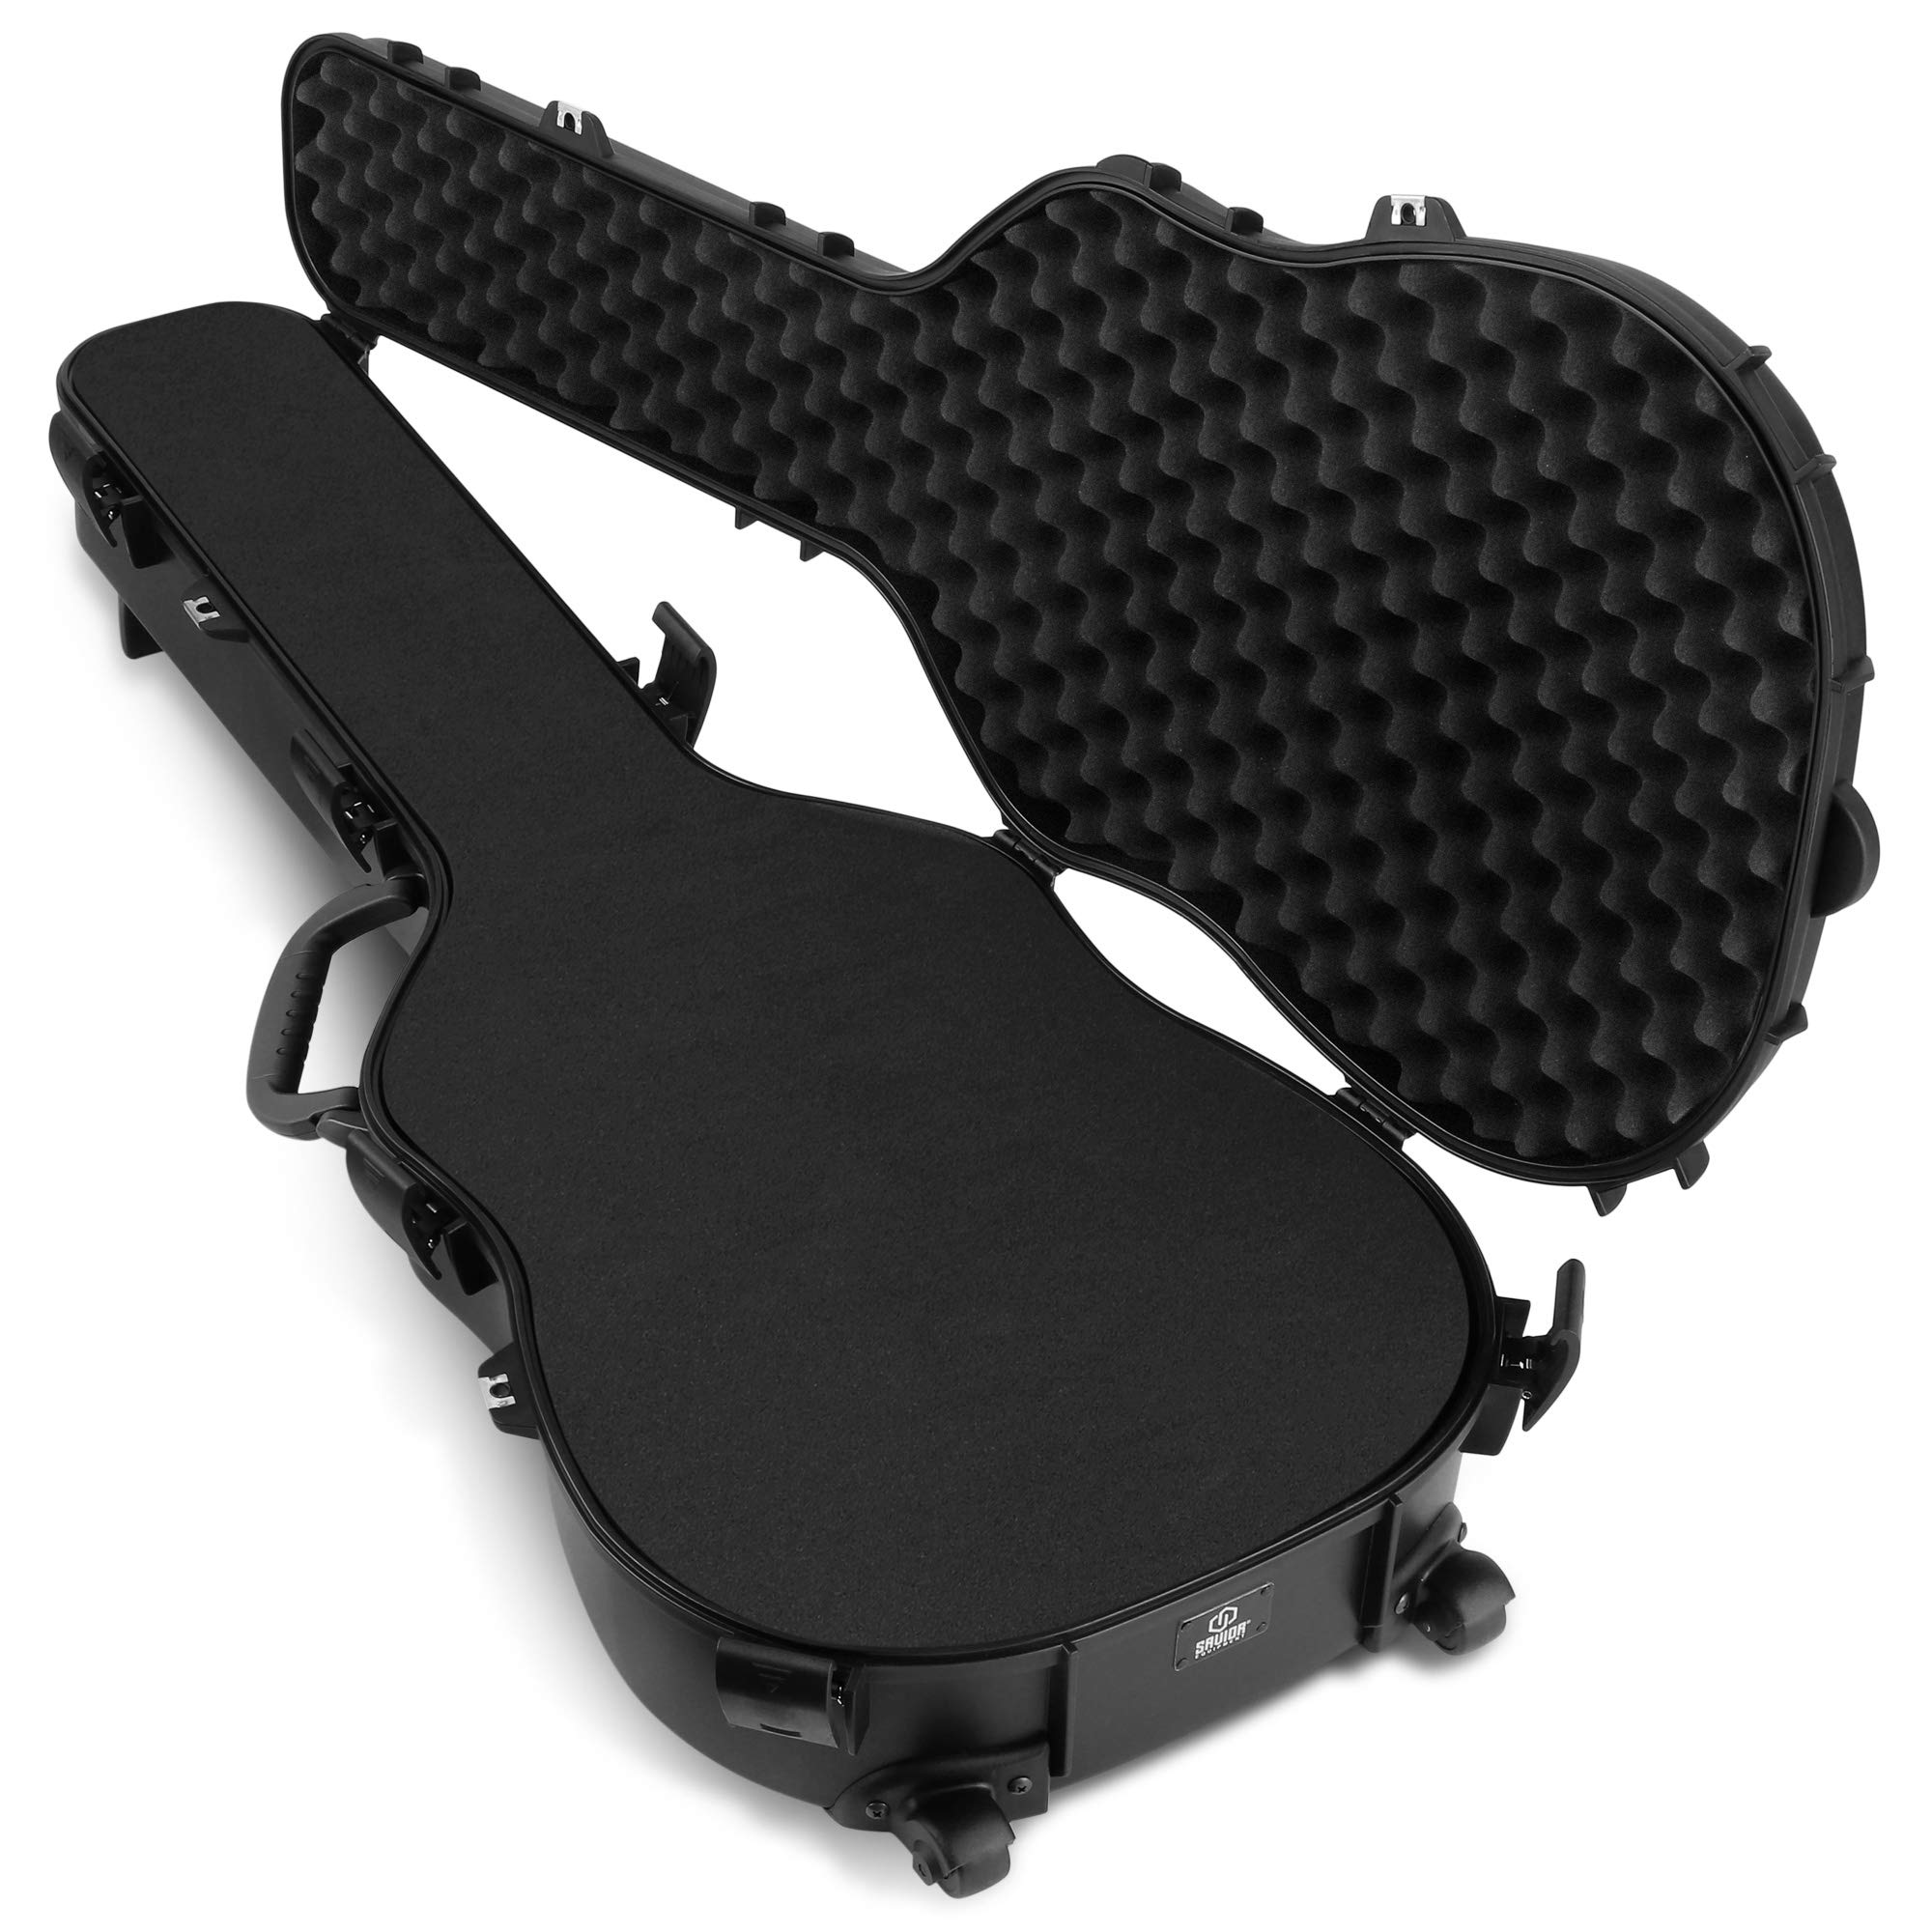 Savior Equipment Tactical Discreet Ultimate